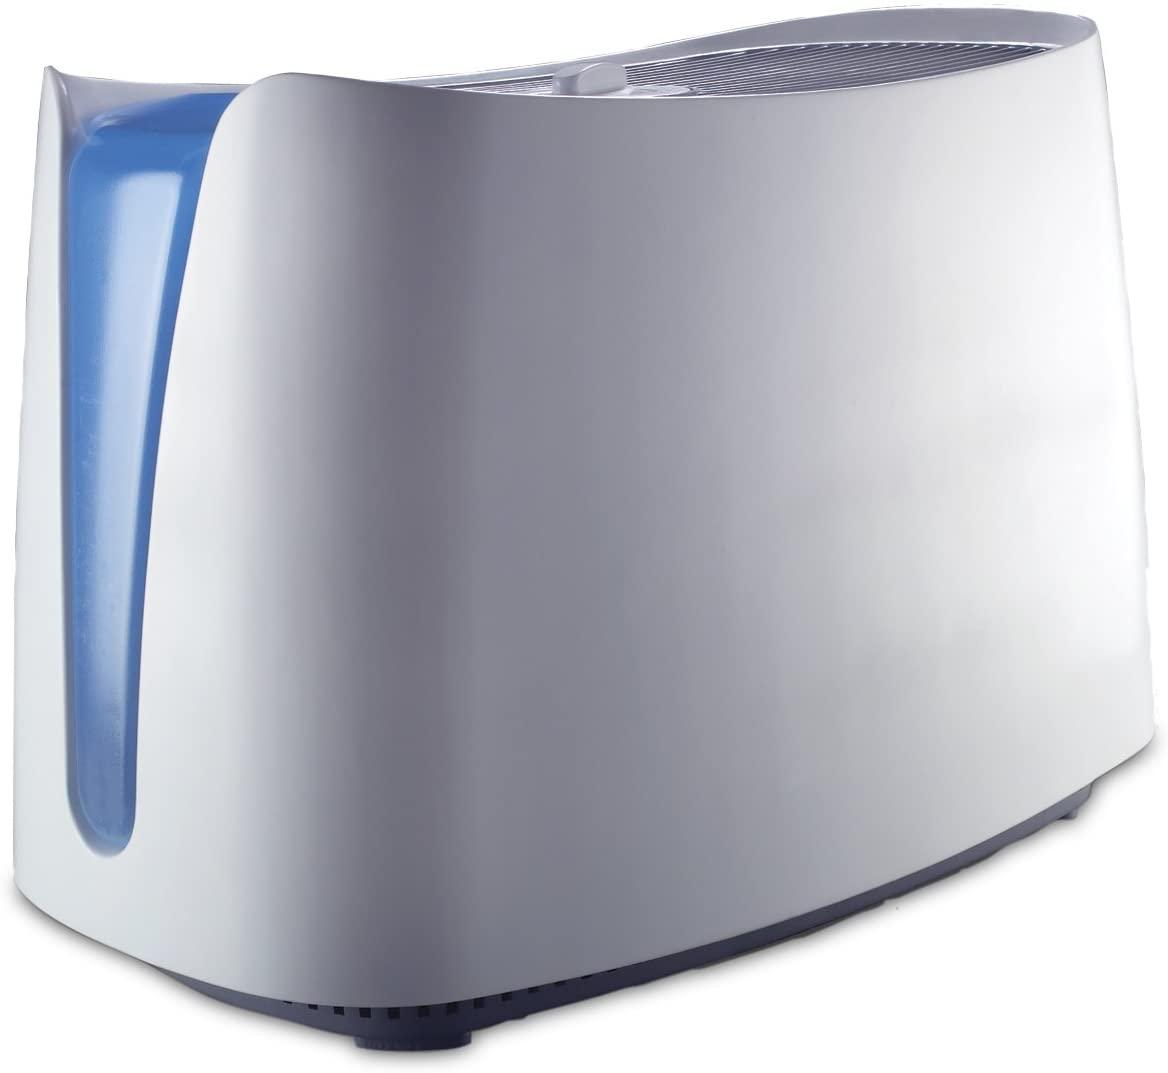 honeywell humidifier, amazon humidifier, best humidifier amazon